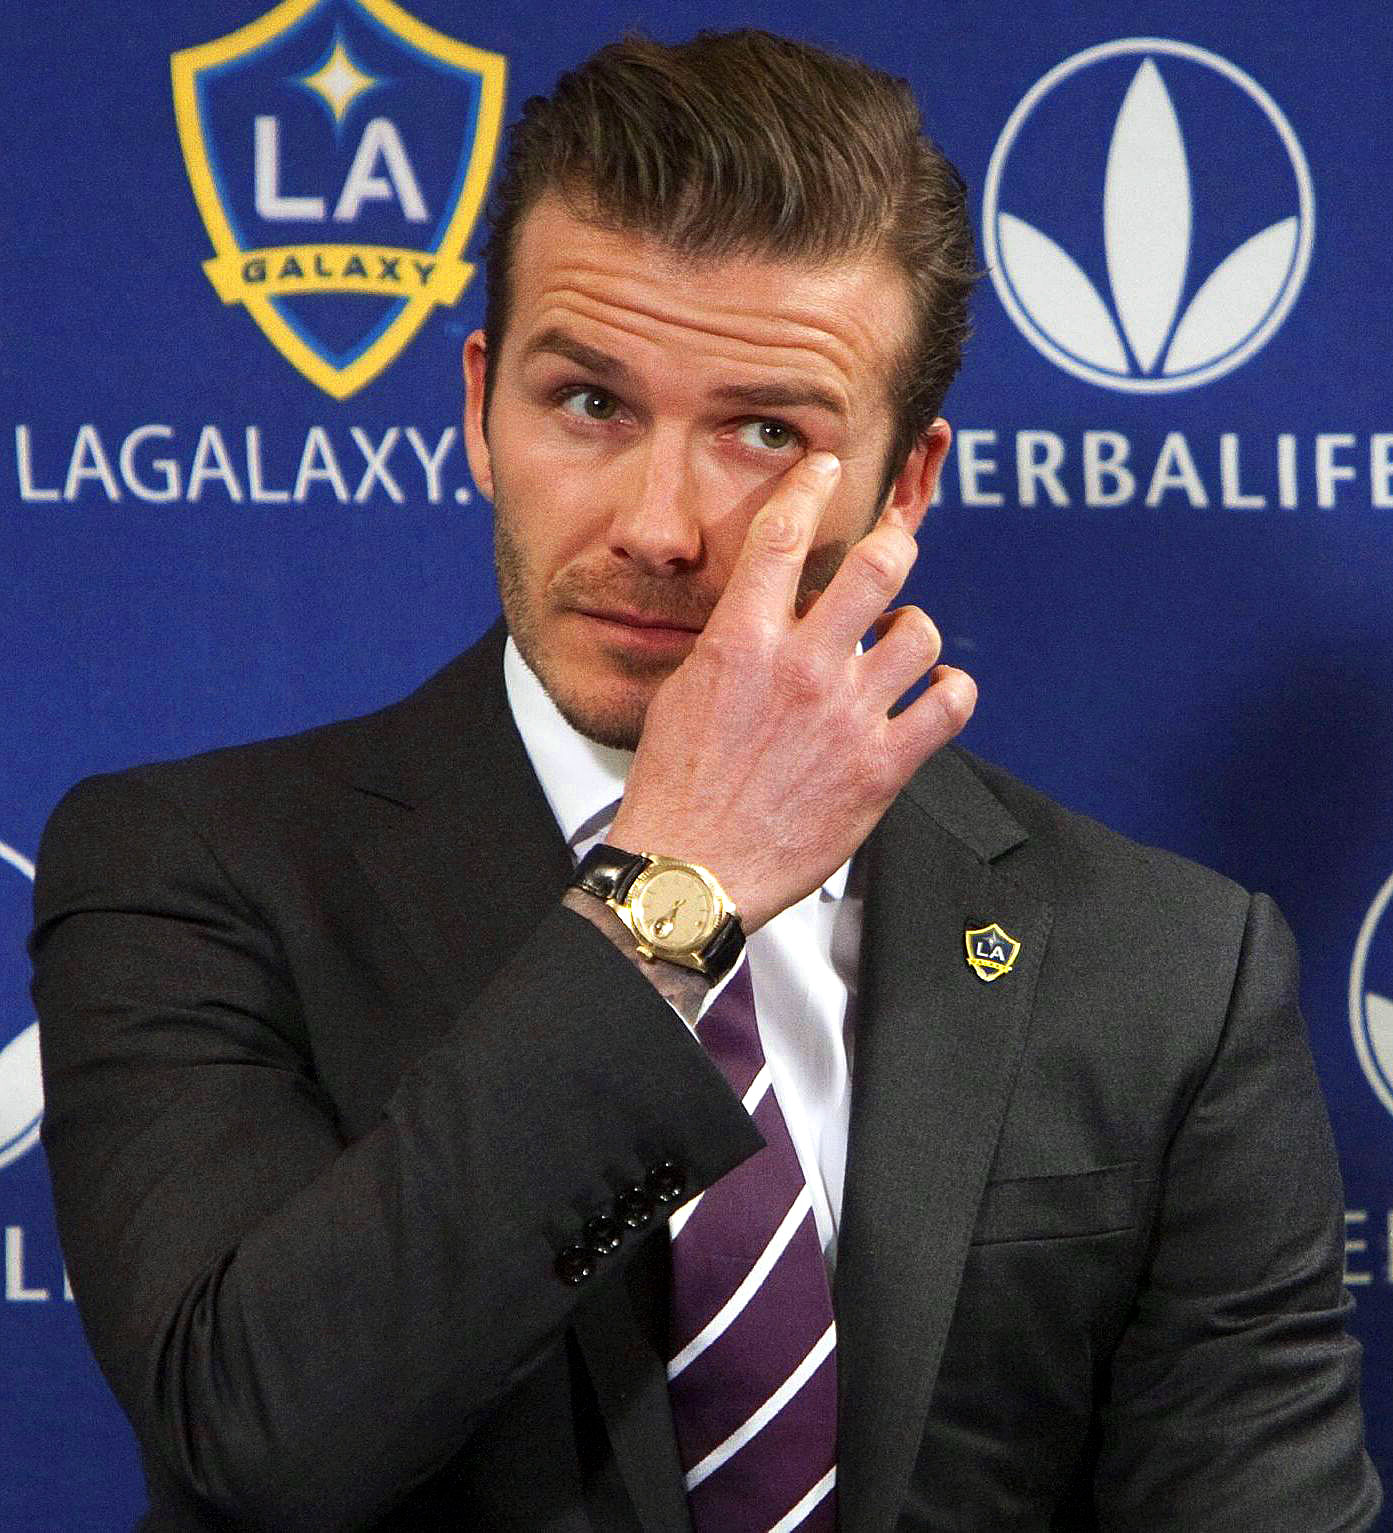 David Beckham Watch Rolex